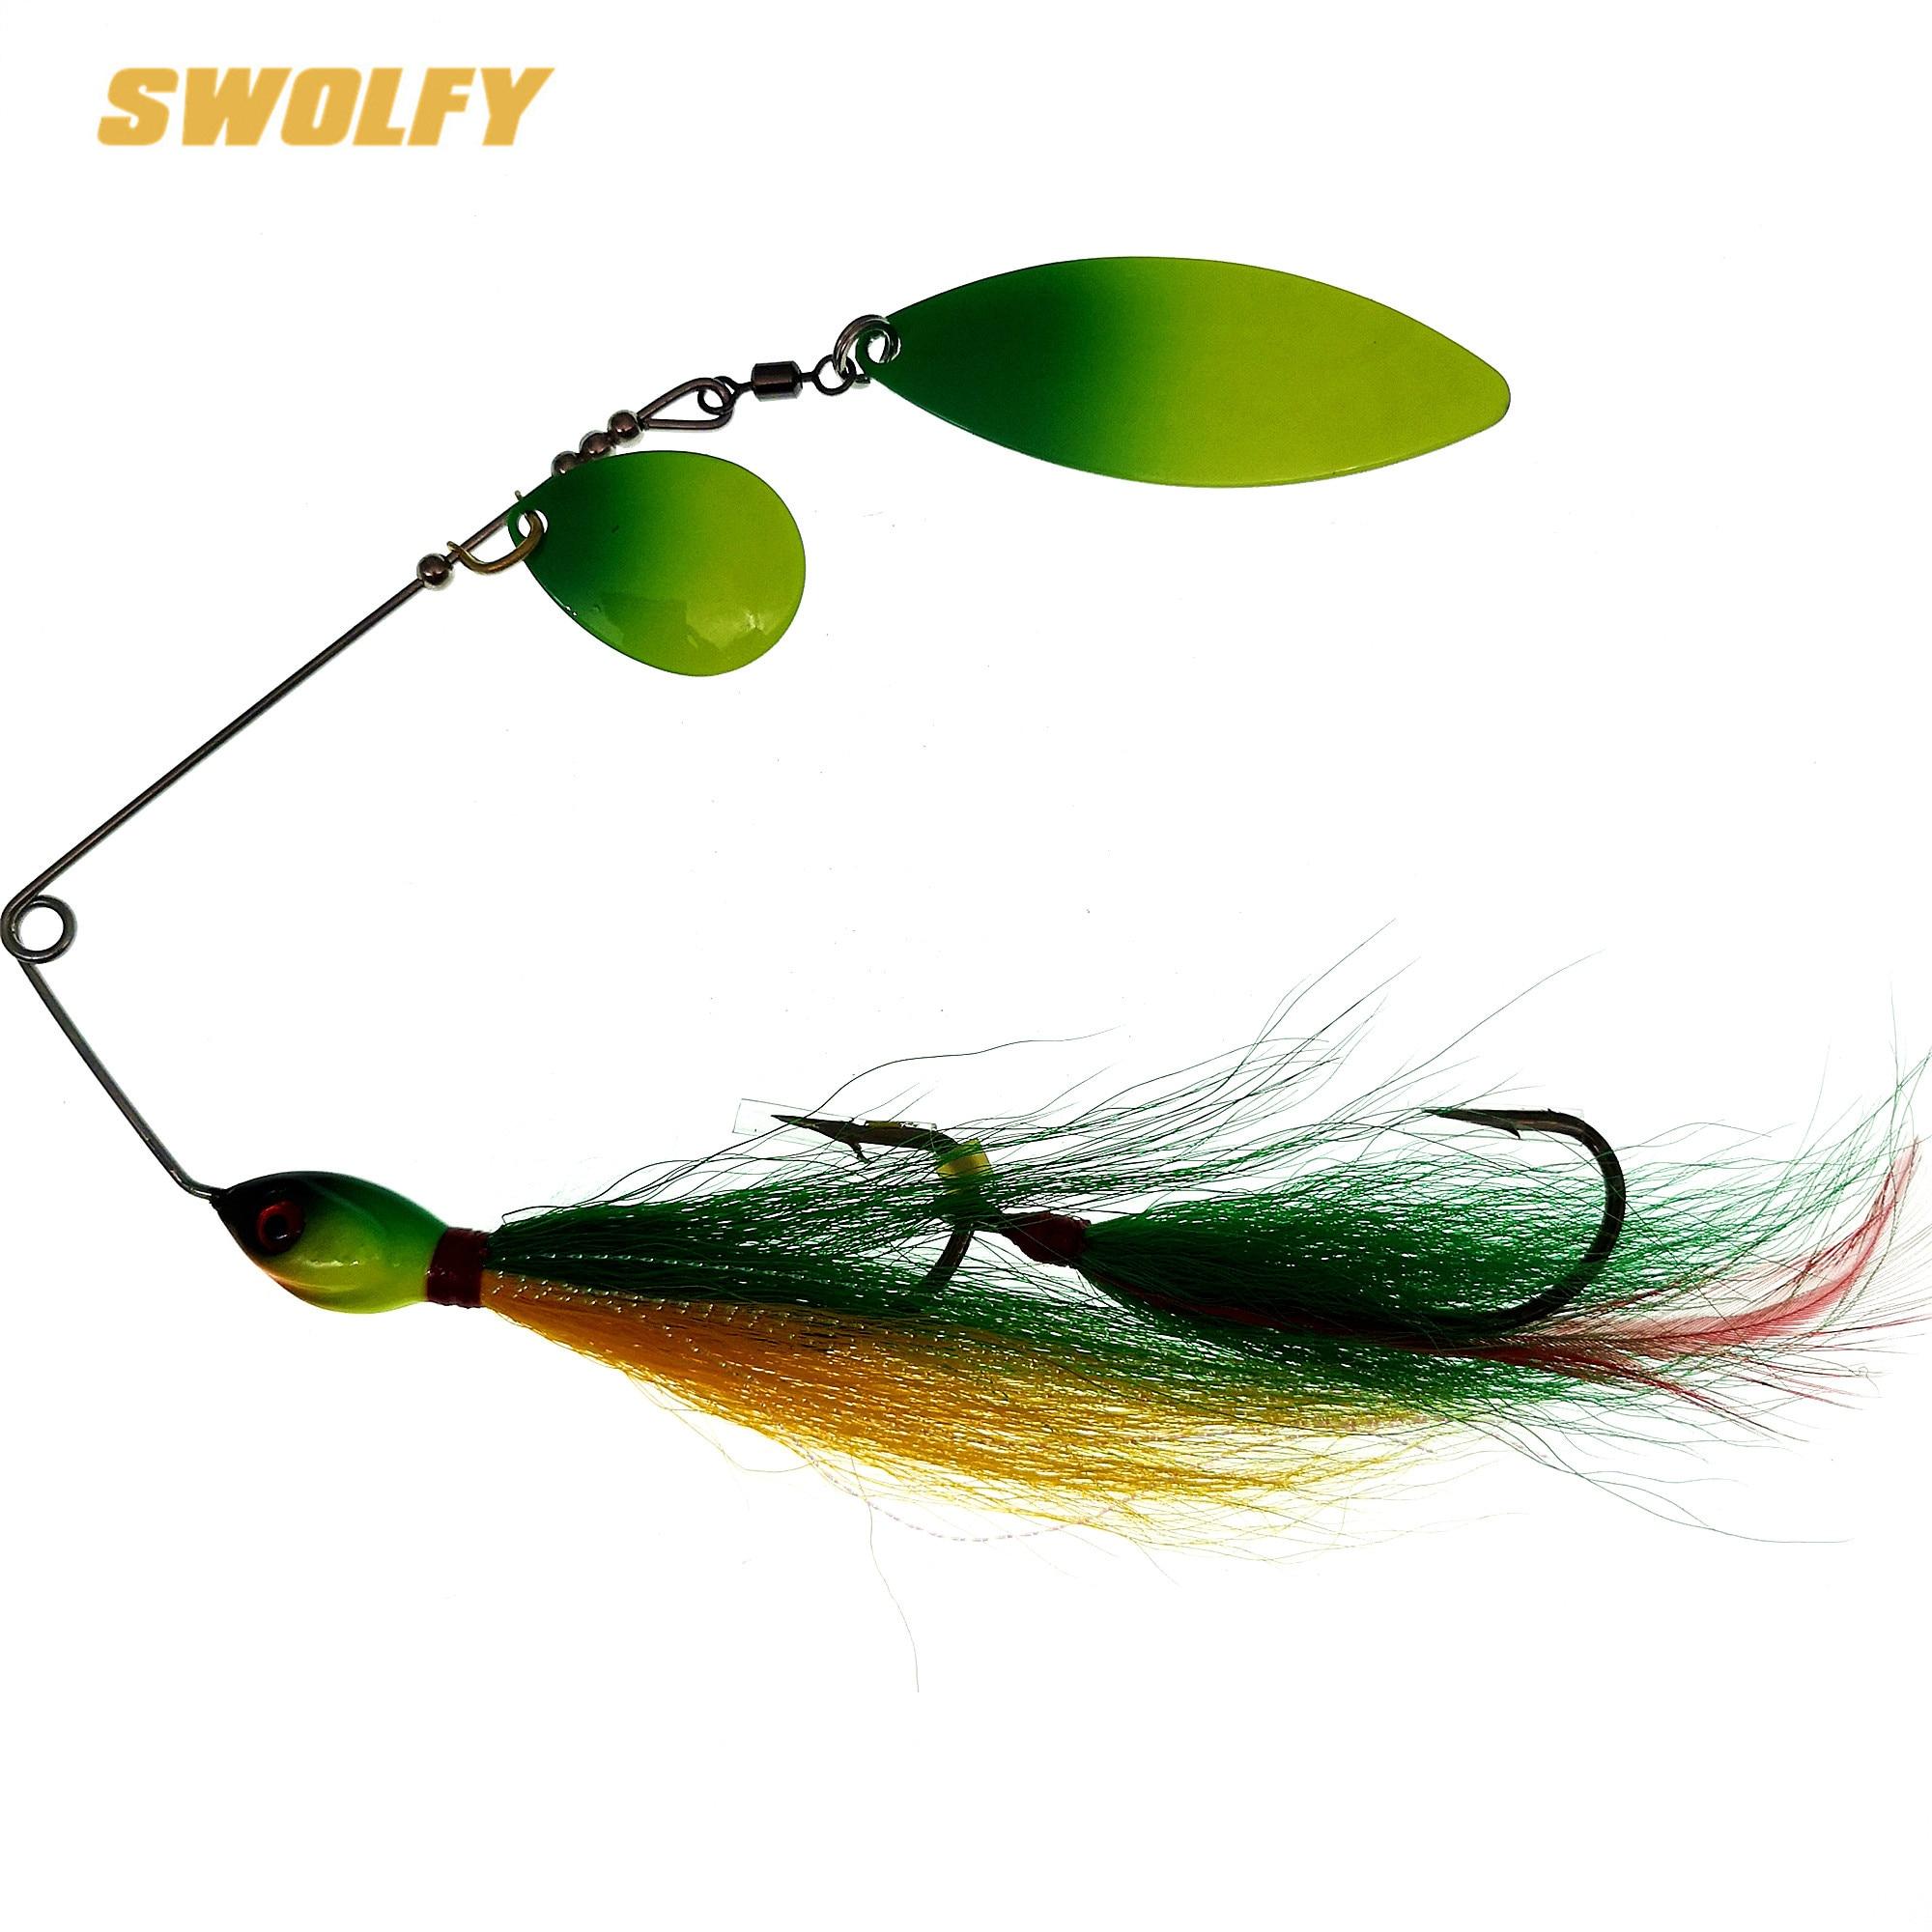 SWOLFY-طعم معدني لامع لصيد الأسماك ، إغراء لصيد الأسماك مثل البايك ، مع المتذبذبات والملعقة والغزلان